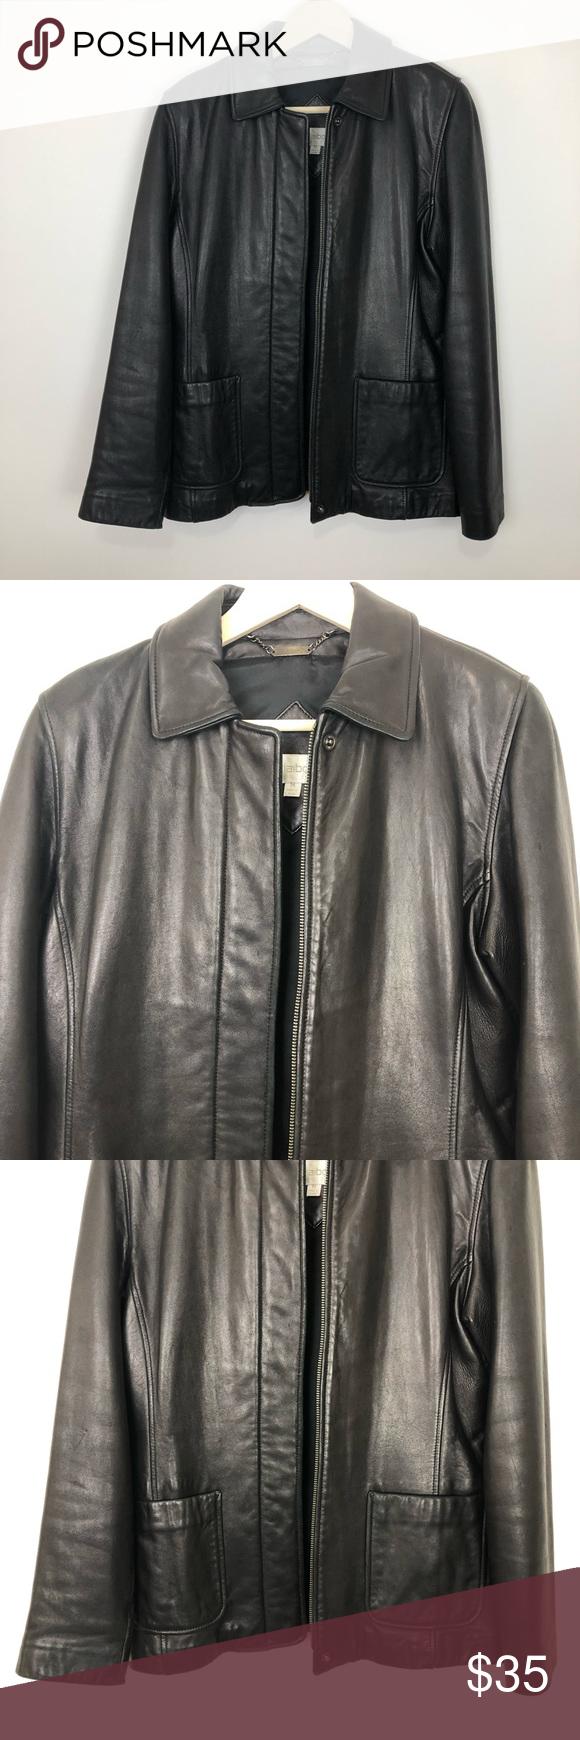 Liz Claiborne Black Leather Jacket Medium Leather Jacket Black Leather Jacket Liz Claiborne